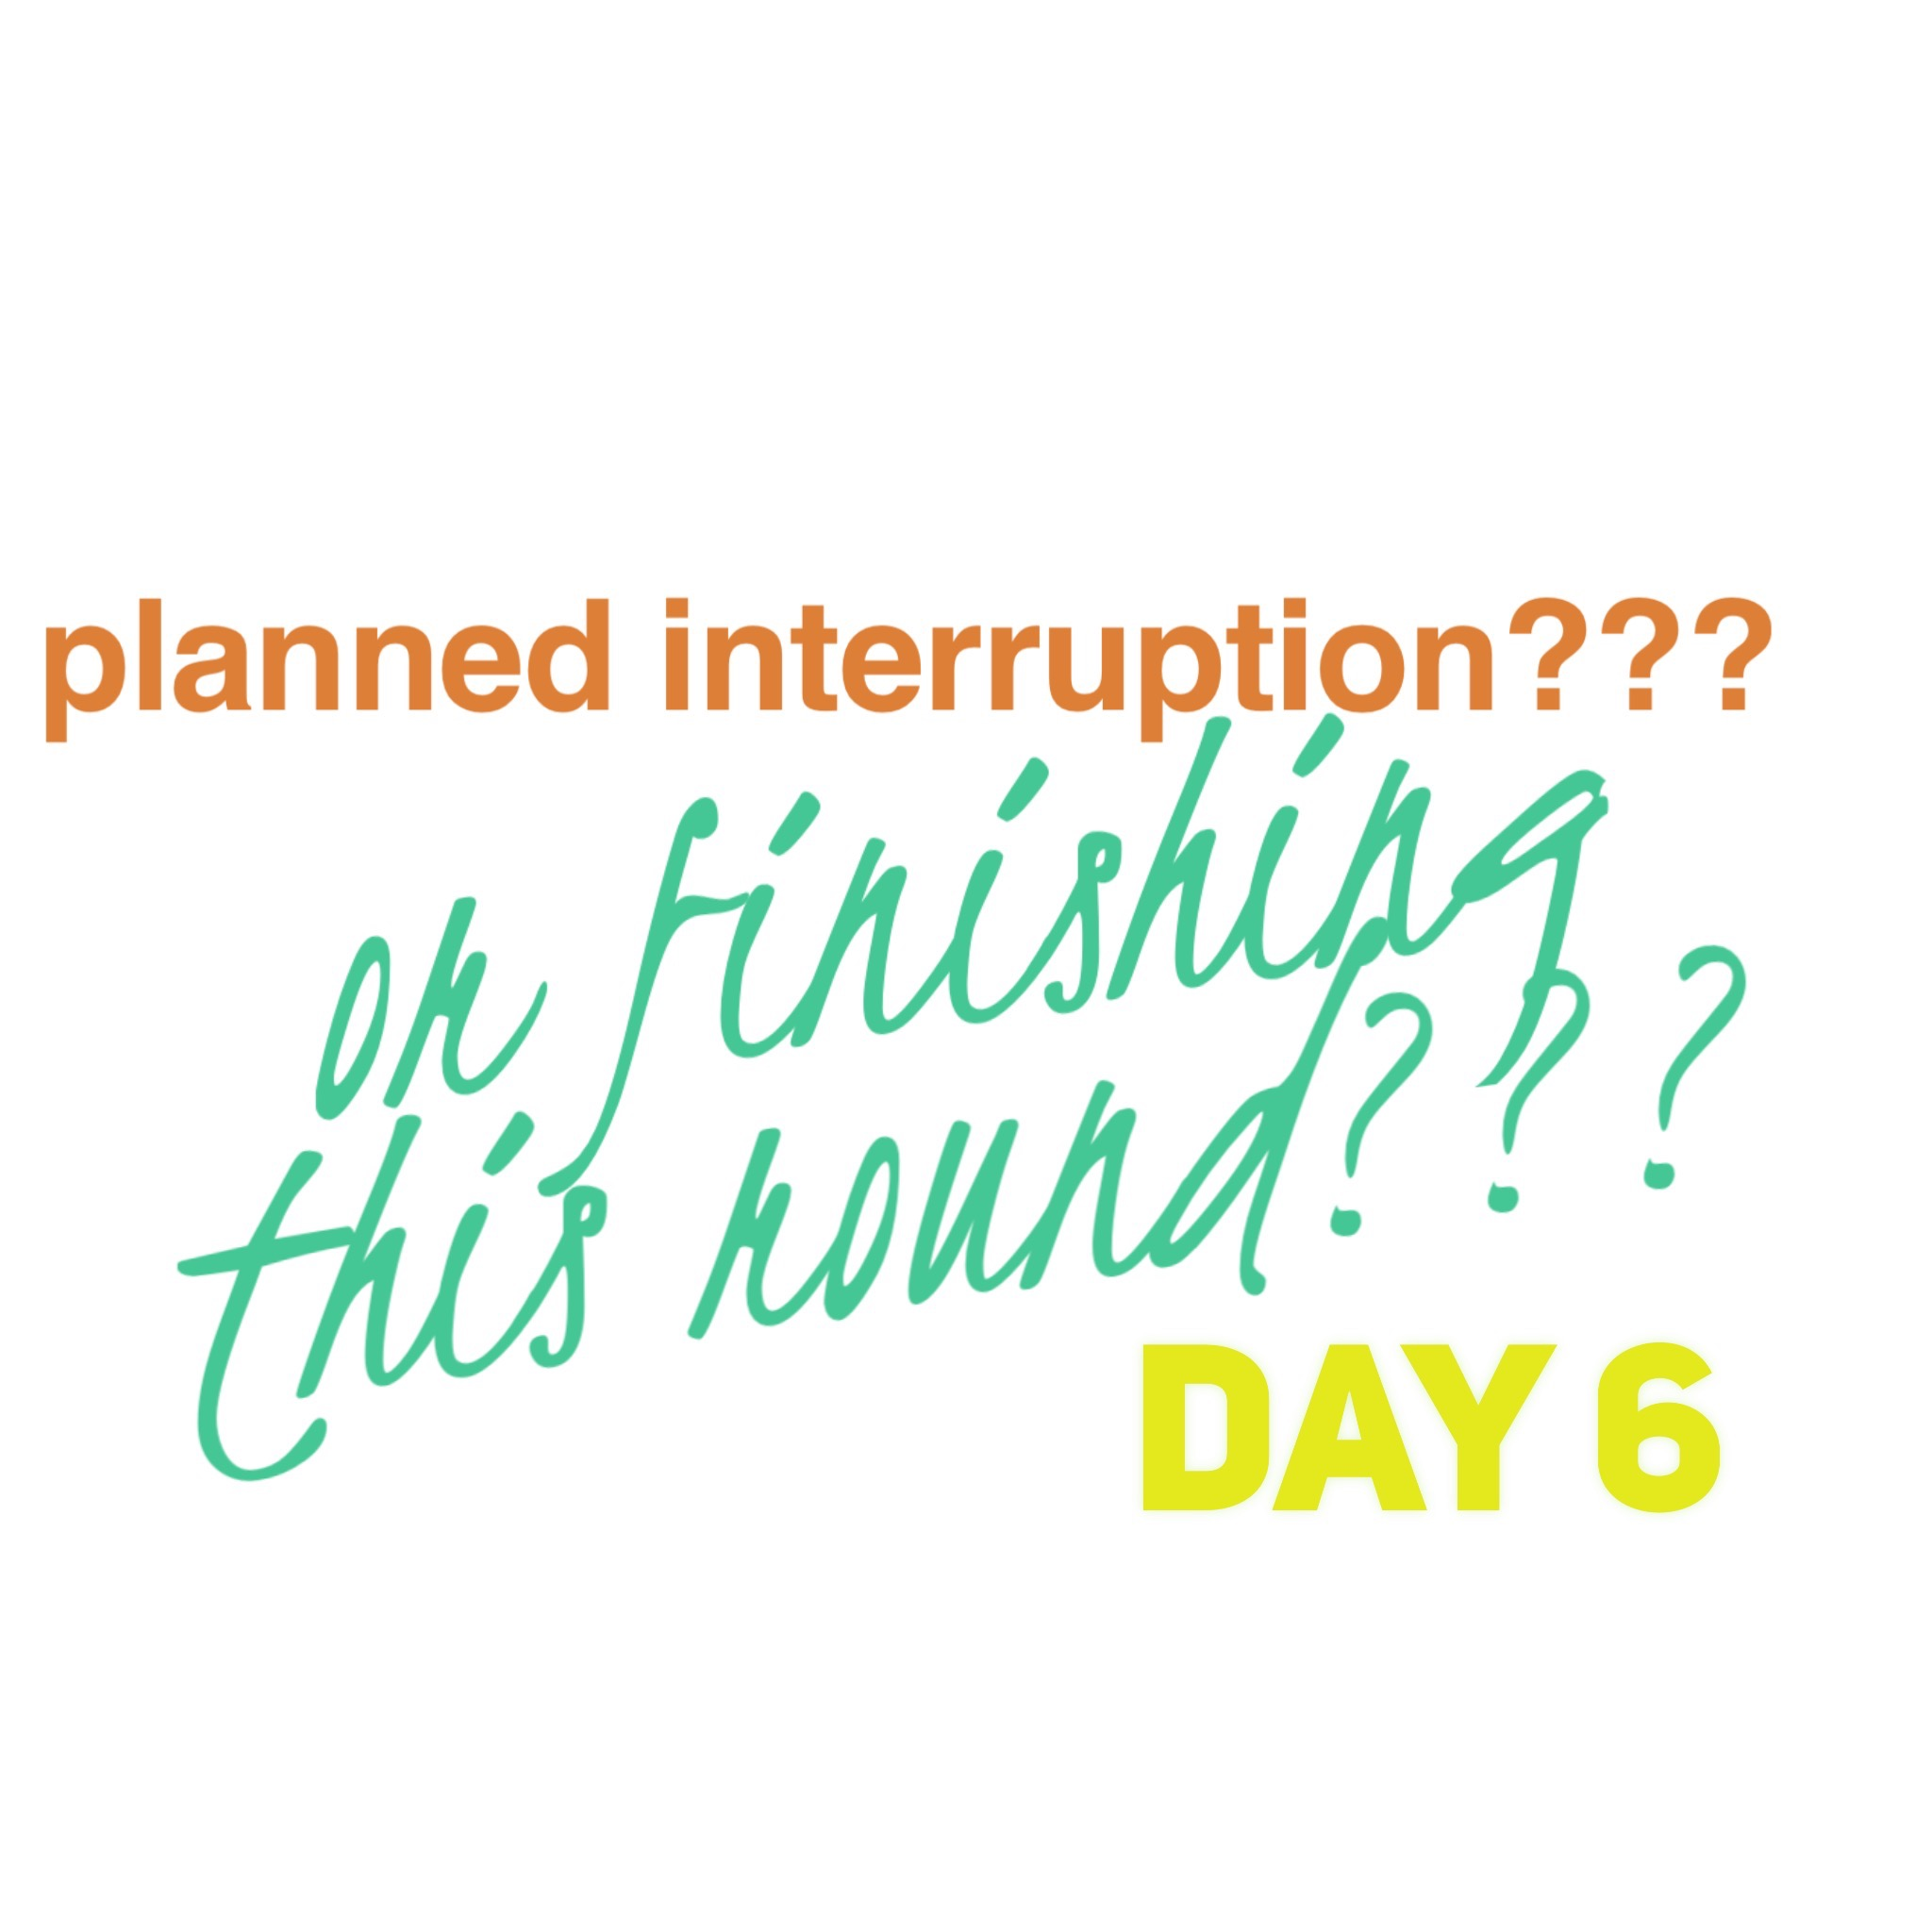 PI  Day 6 (P2R2)